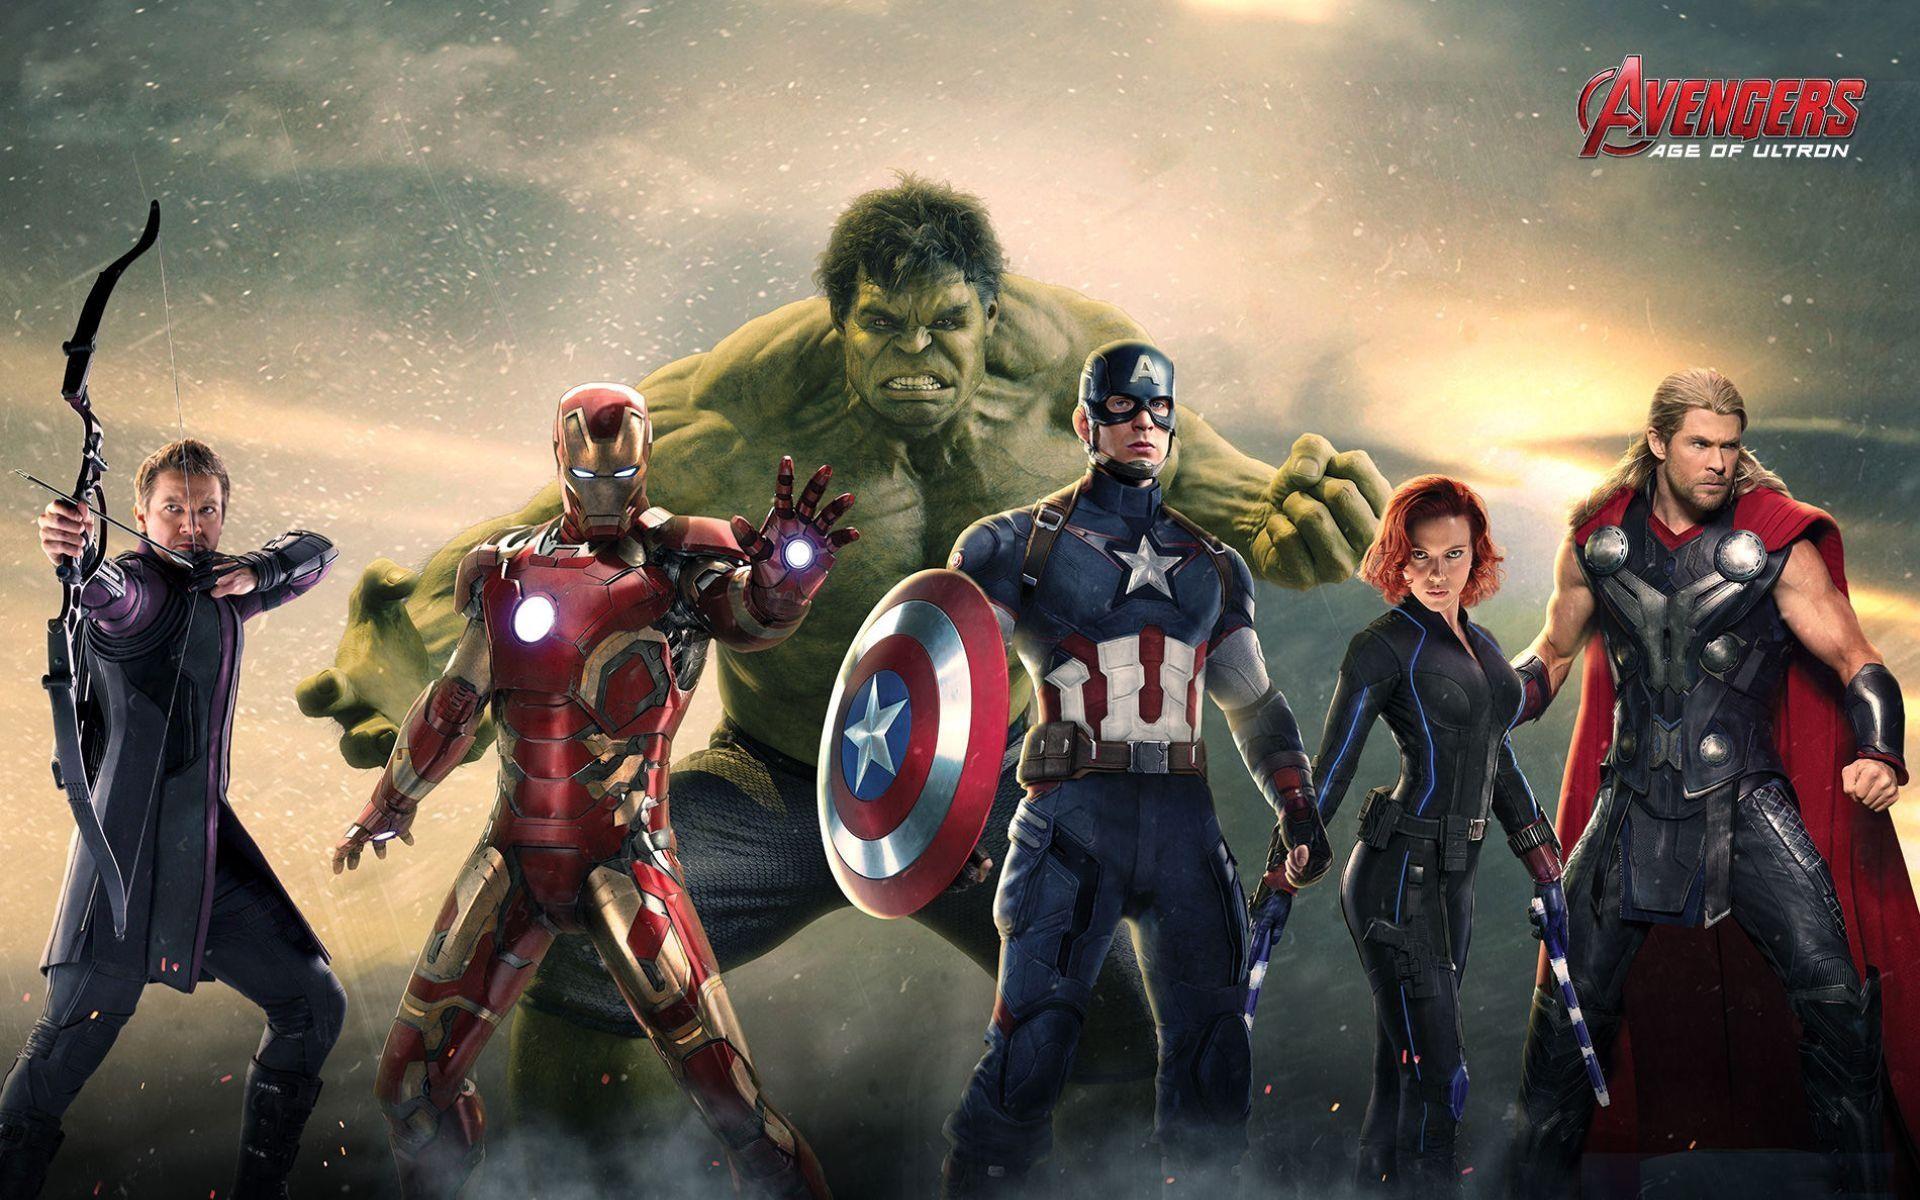 Download Avengers Age Of Ultron Wallpaper Desktop Background 51n Wallreturn Com Avengers Cartoon Avengers Movie Posters Avengers